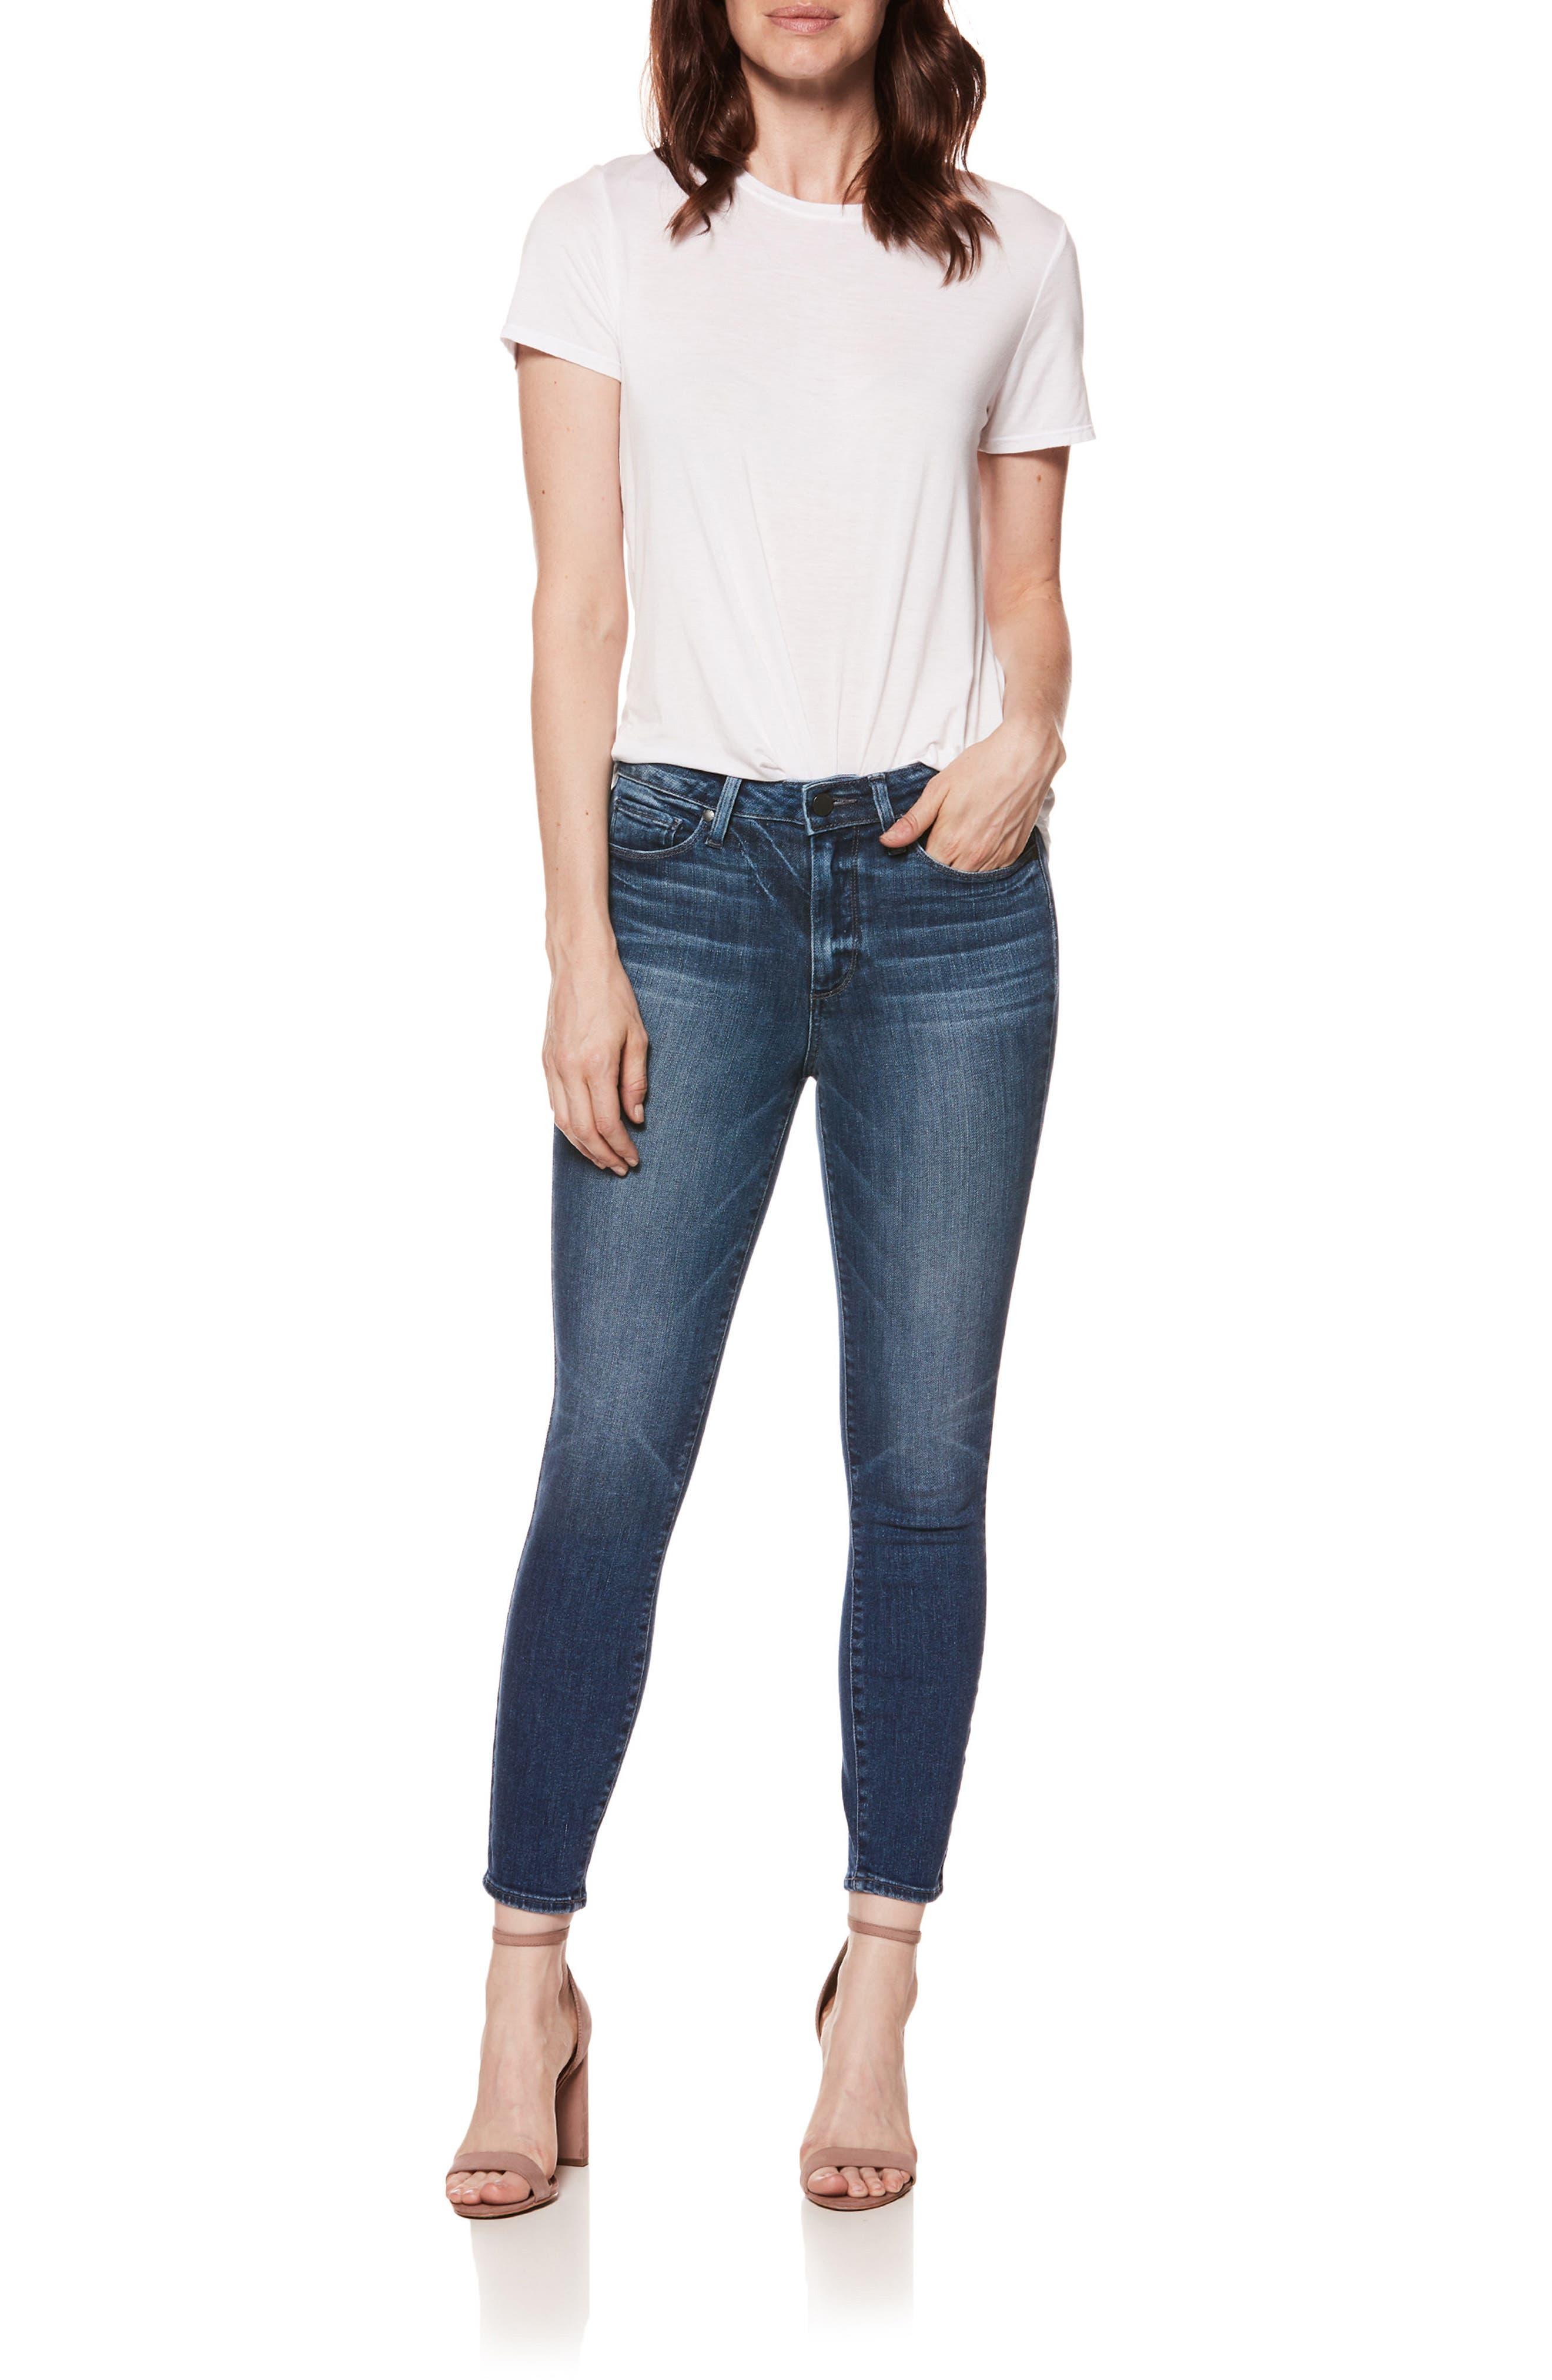 Hoxton High Waist Ankle Skinny Jeans,                             Alternate thumbnail 8, color,                             400